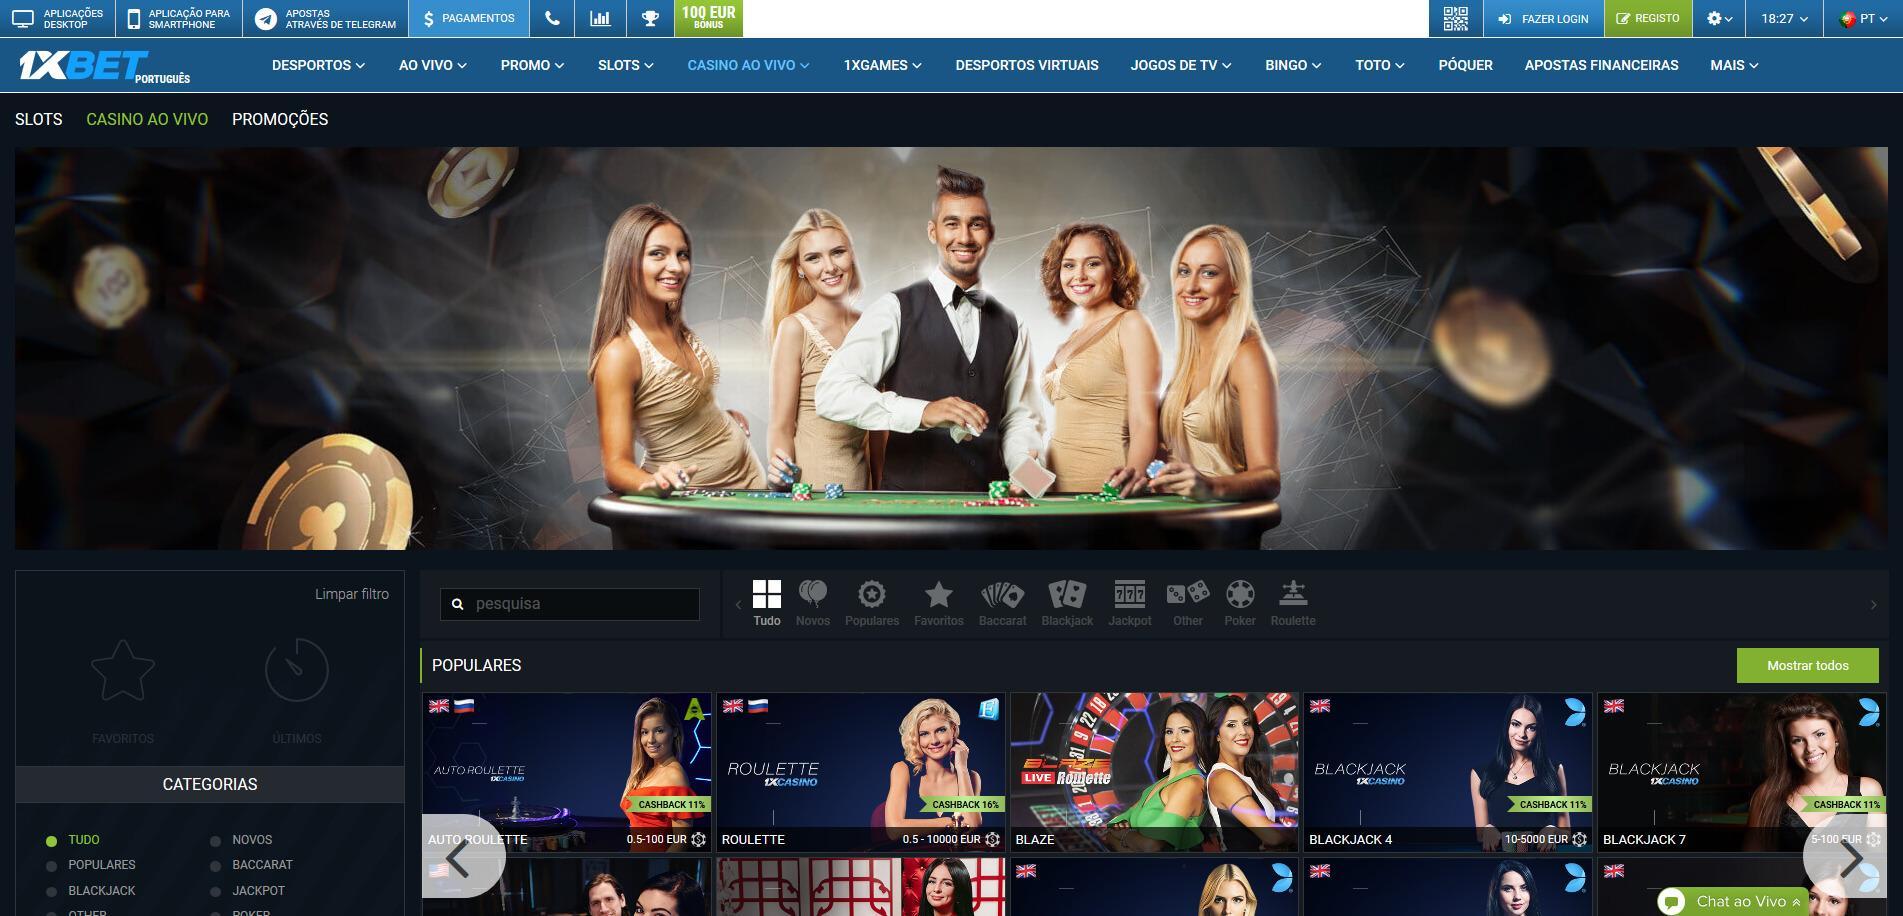 Кратко о казино 1xBet и других разделах сайта